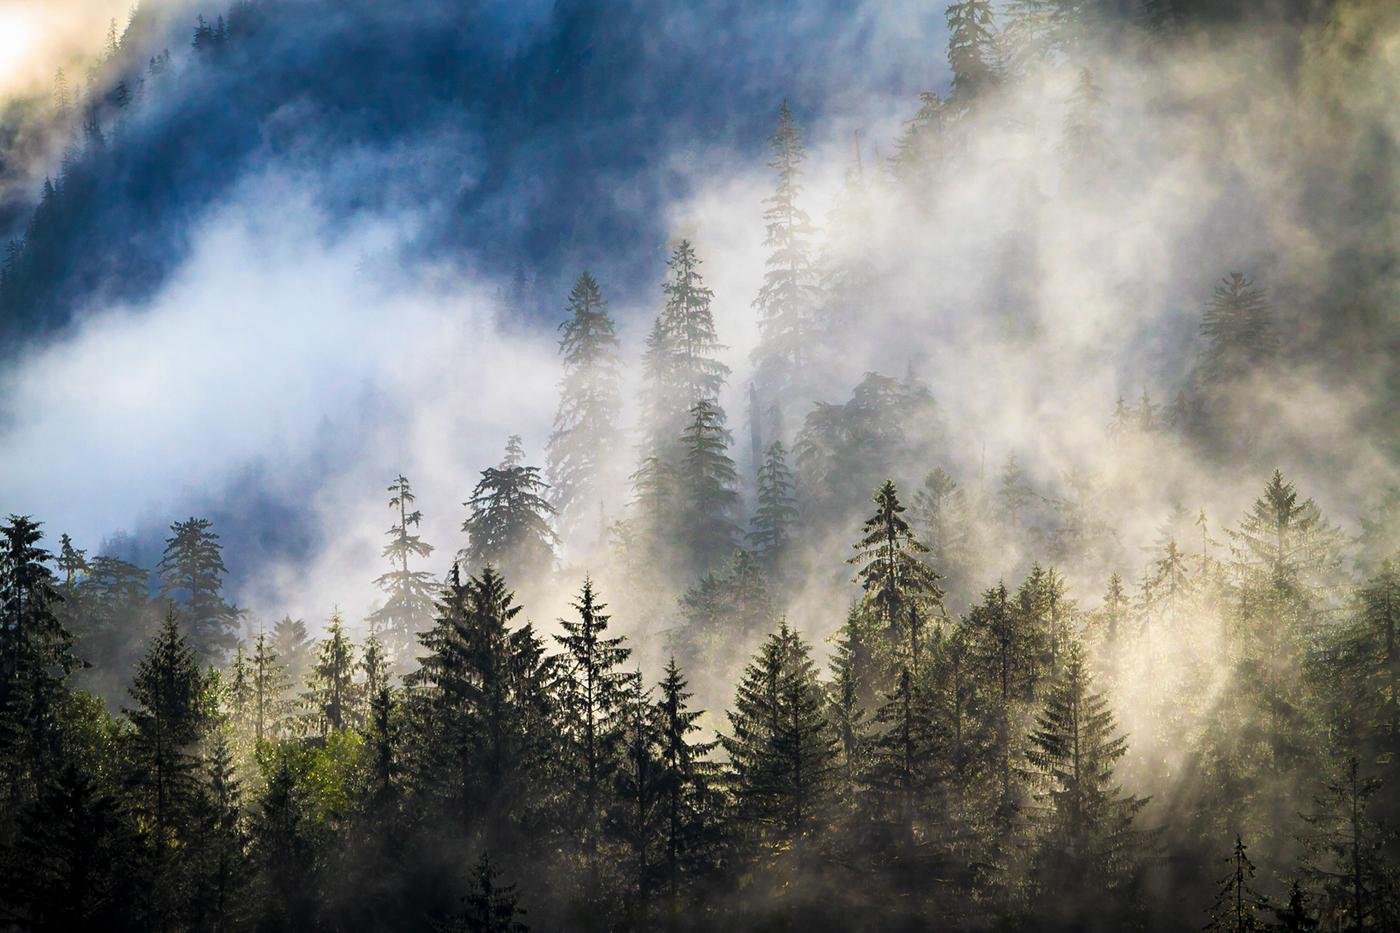 wildlife Khutzeymateen Grizzly Bear Landscape forest sanctuary wilderness north america bears british columbia